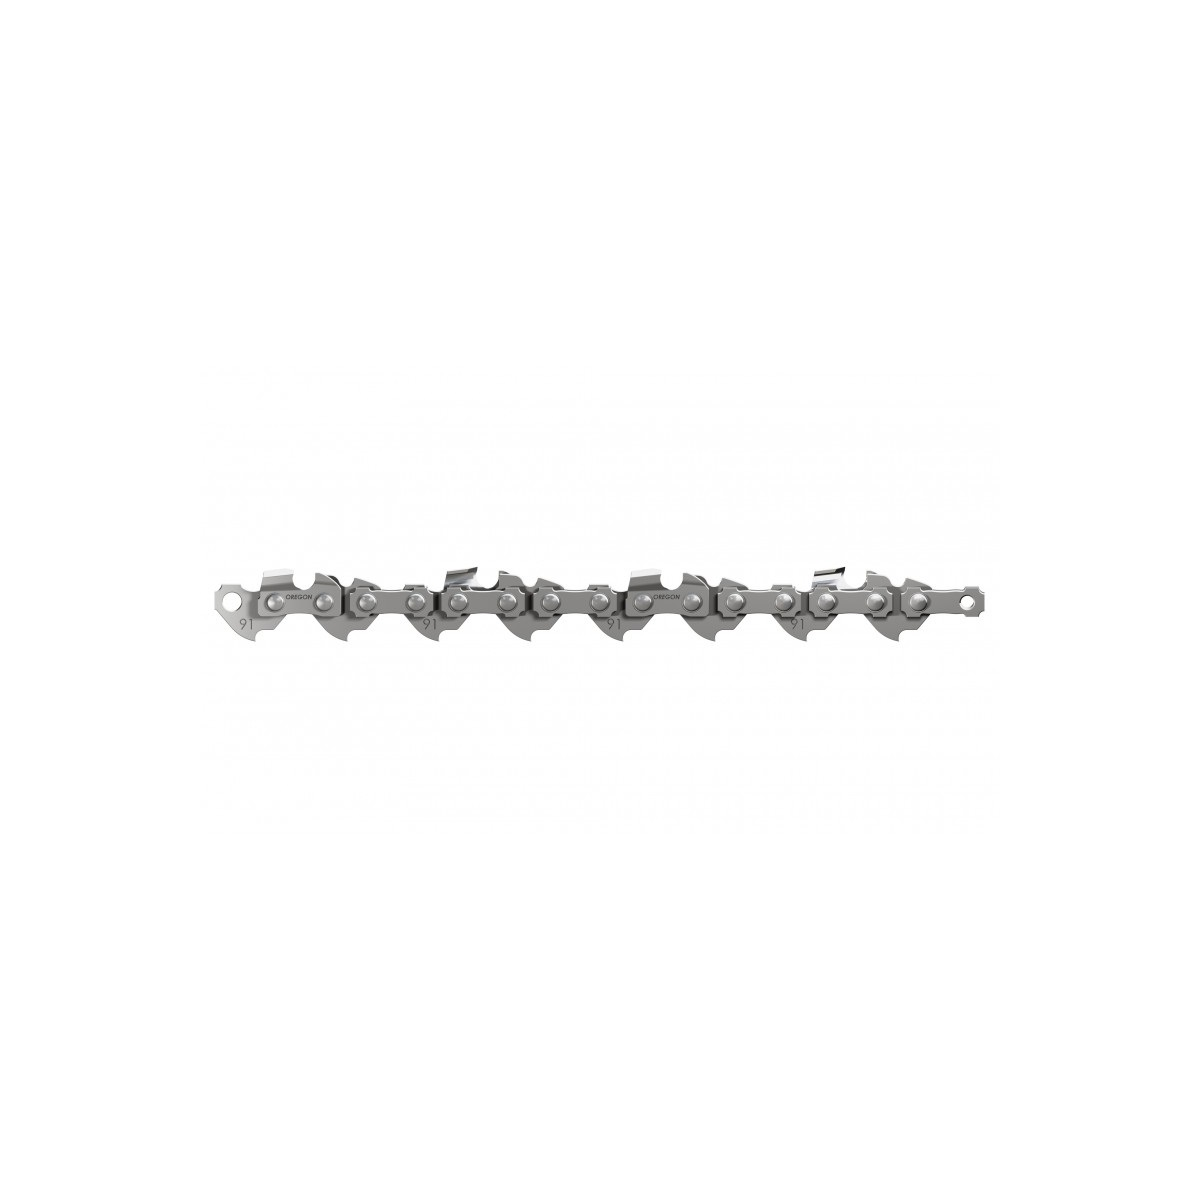 Riwall PRO pilový řetěz OREGON pro CSP 2540 / RPMT 520